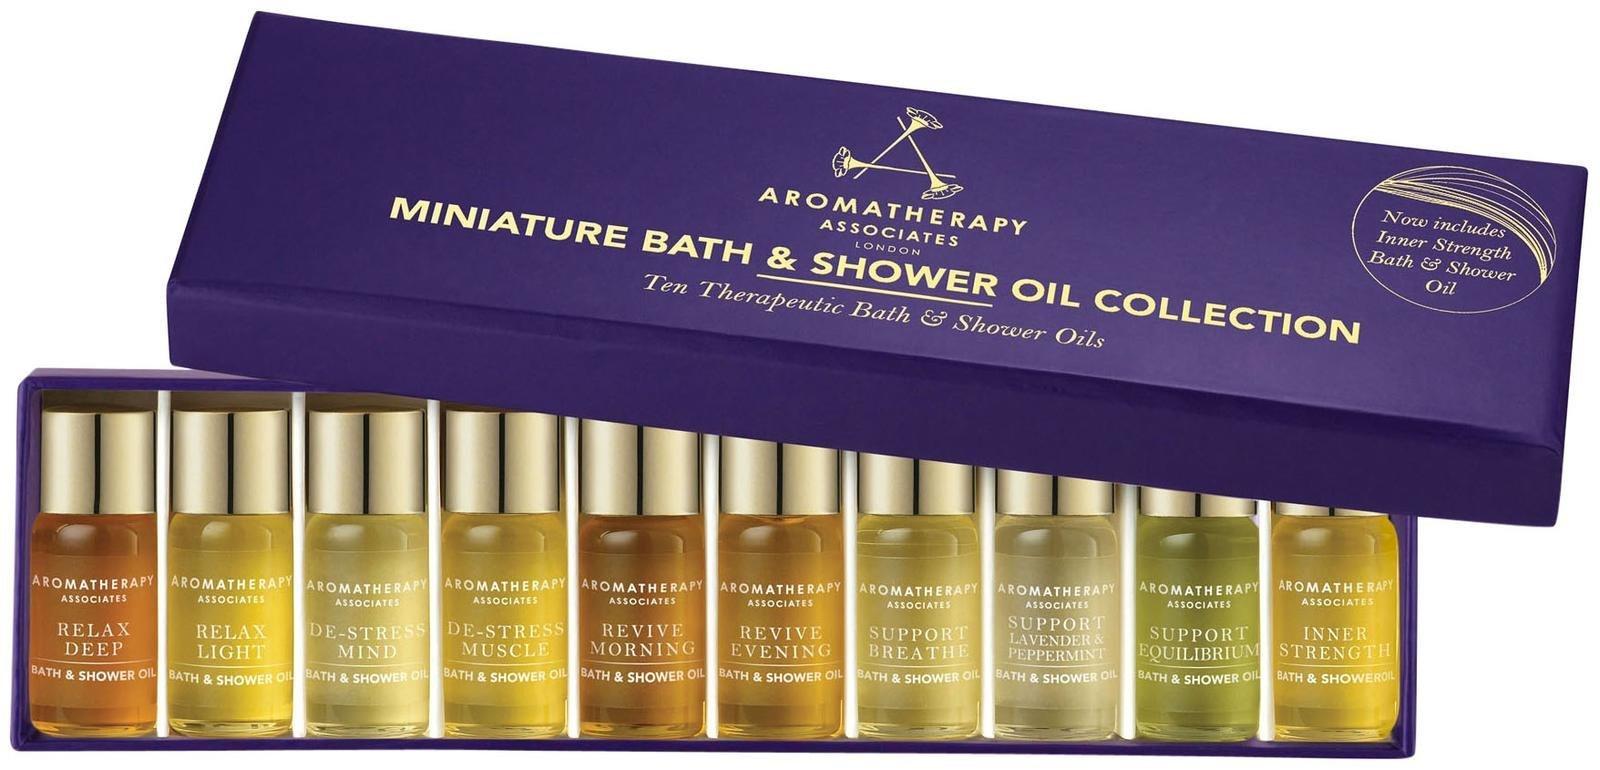 Aromatherapy Associates Miniature Bath & Shower Oil